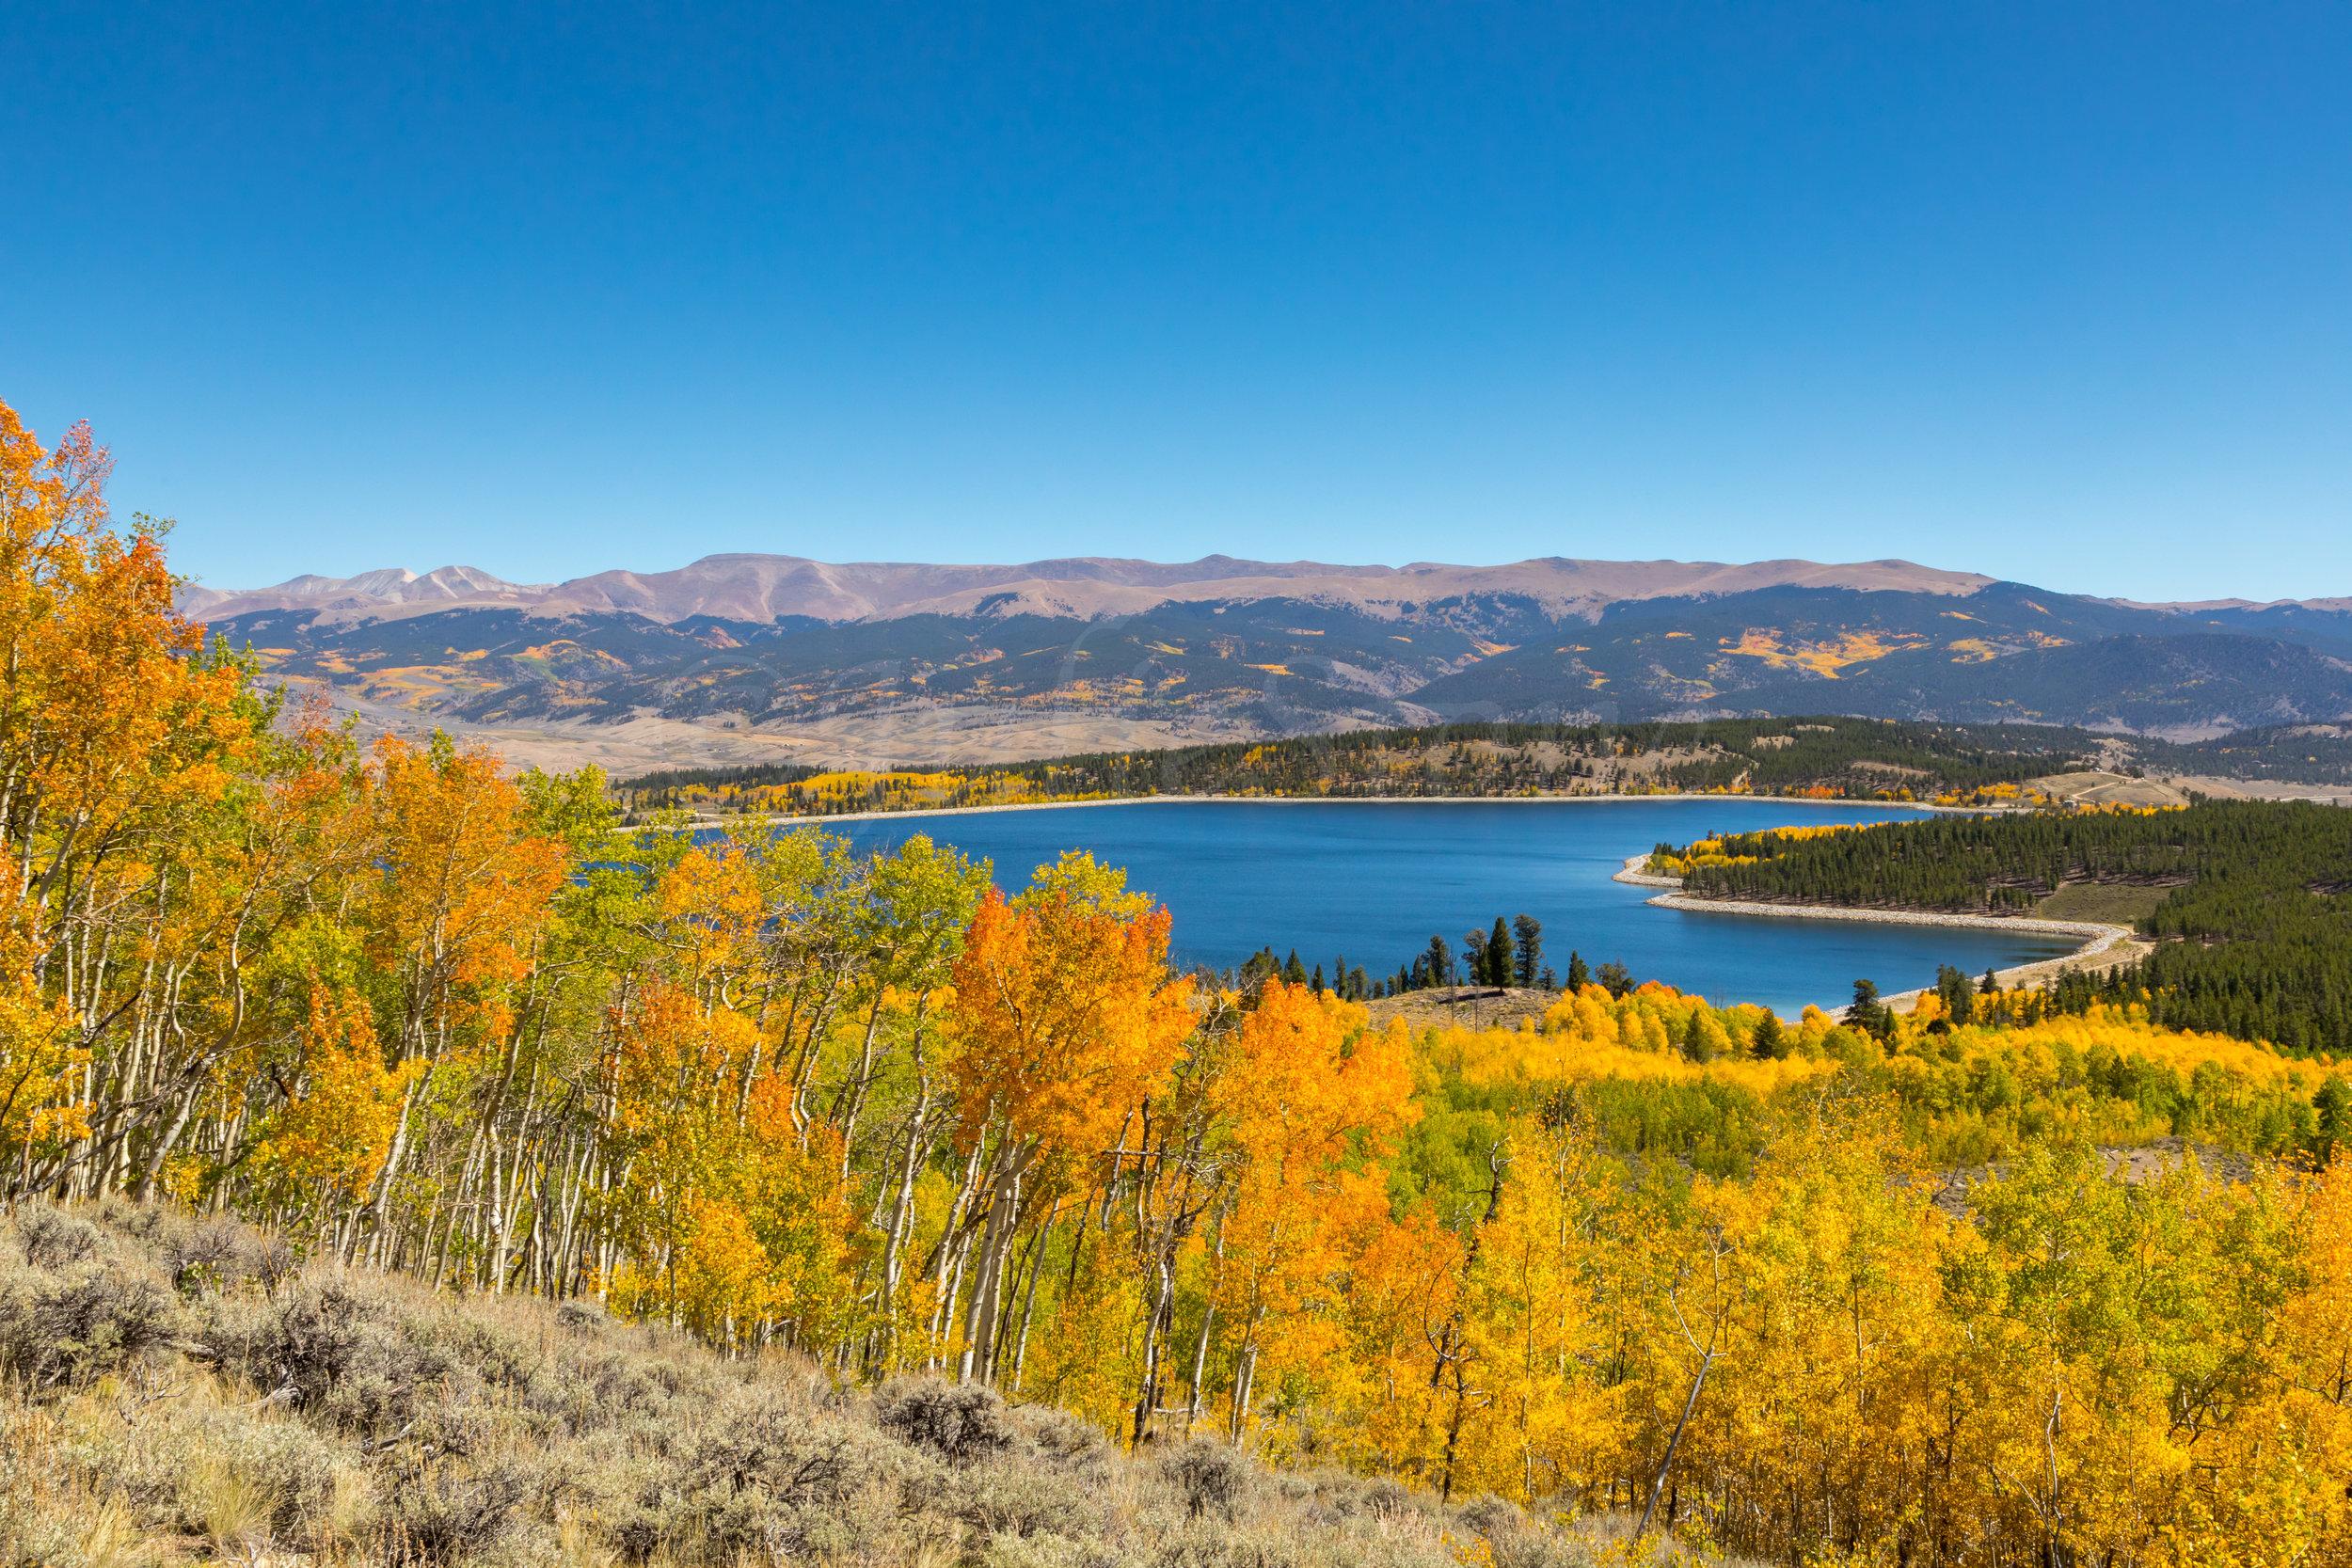 Twin Lakes, Image # 0679